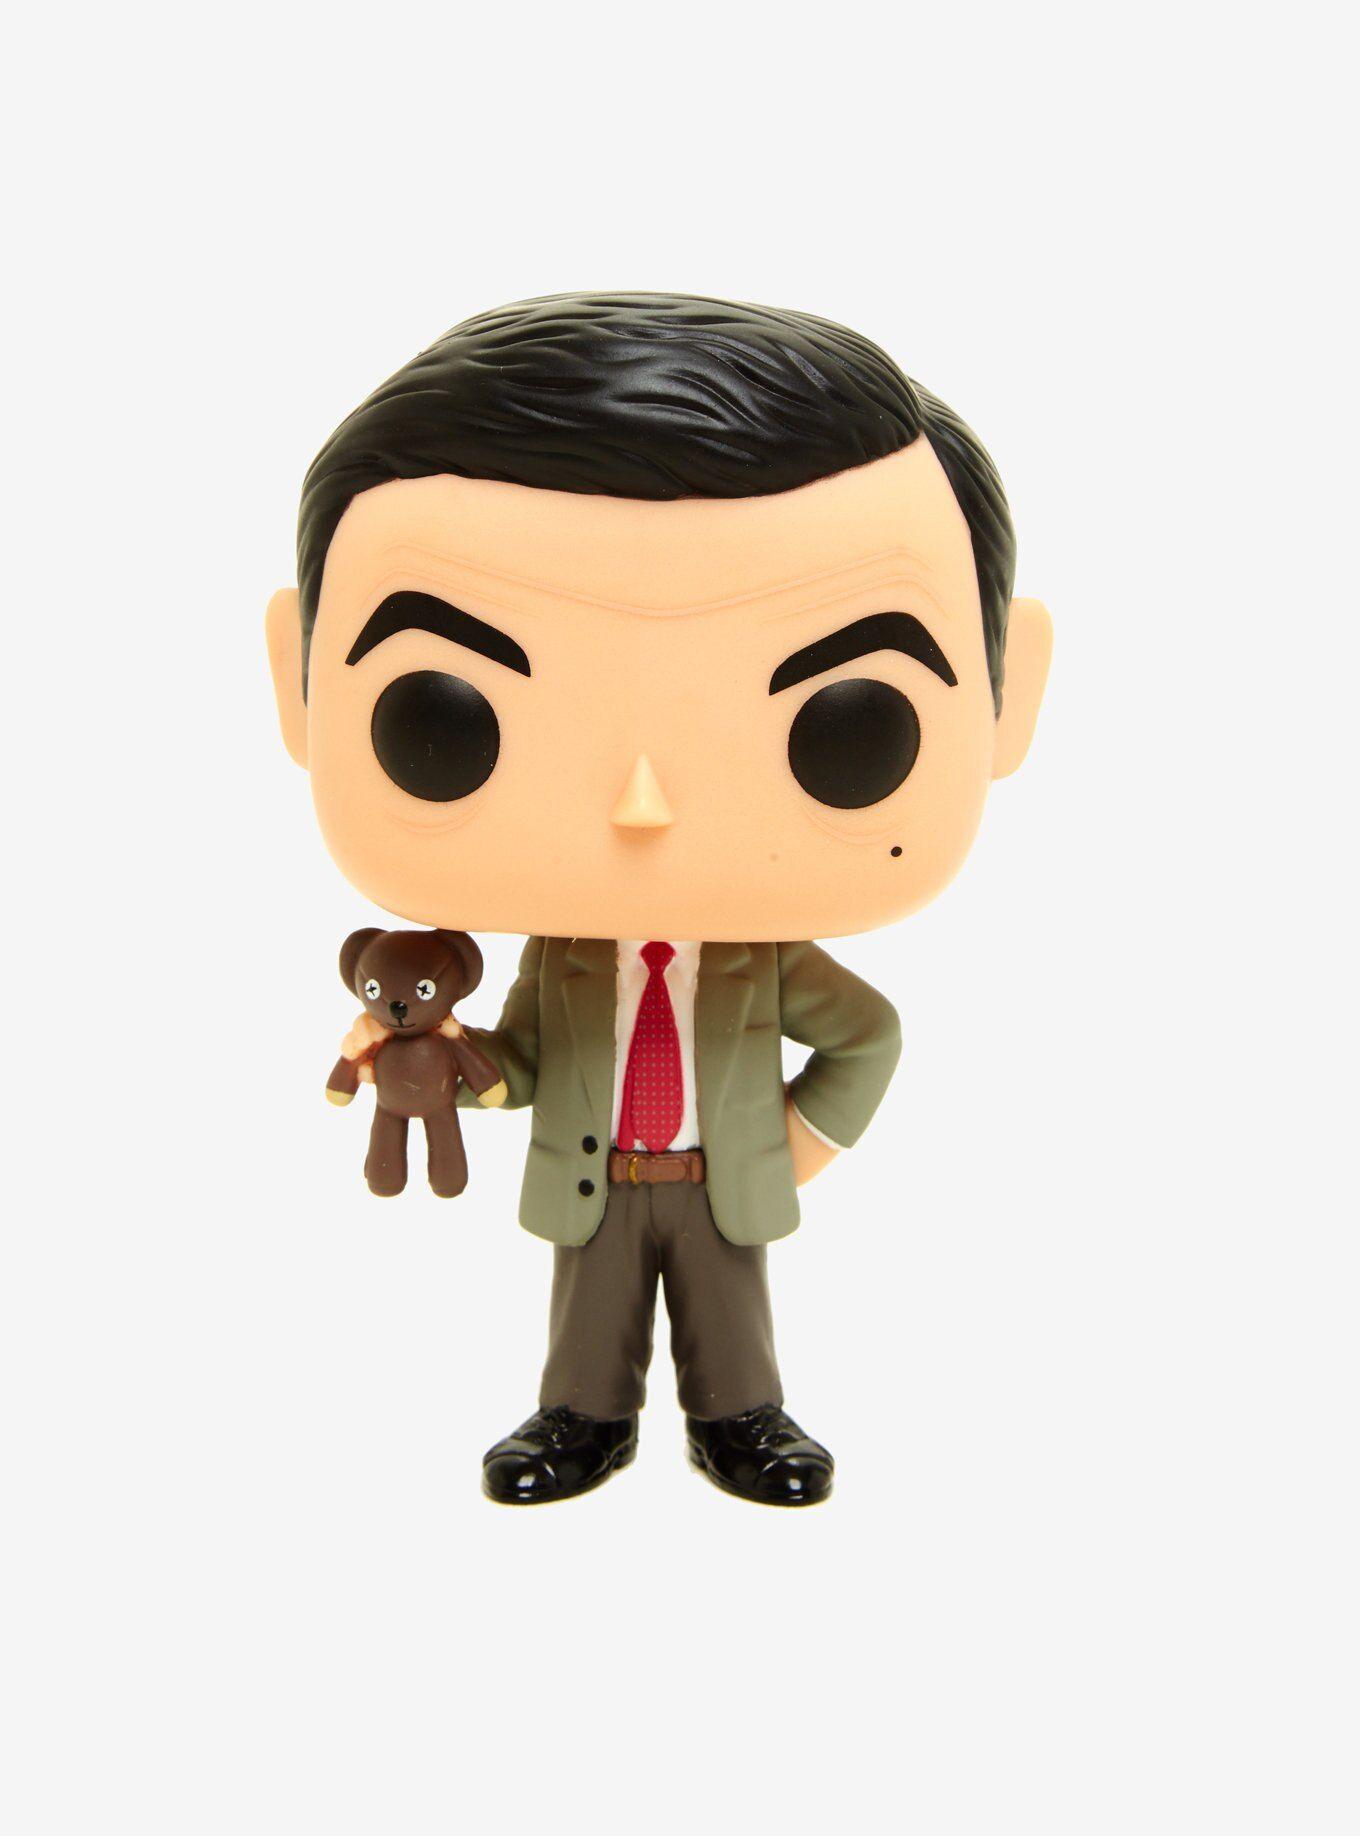 Mr. Bean #592 - Funko Pop! Television